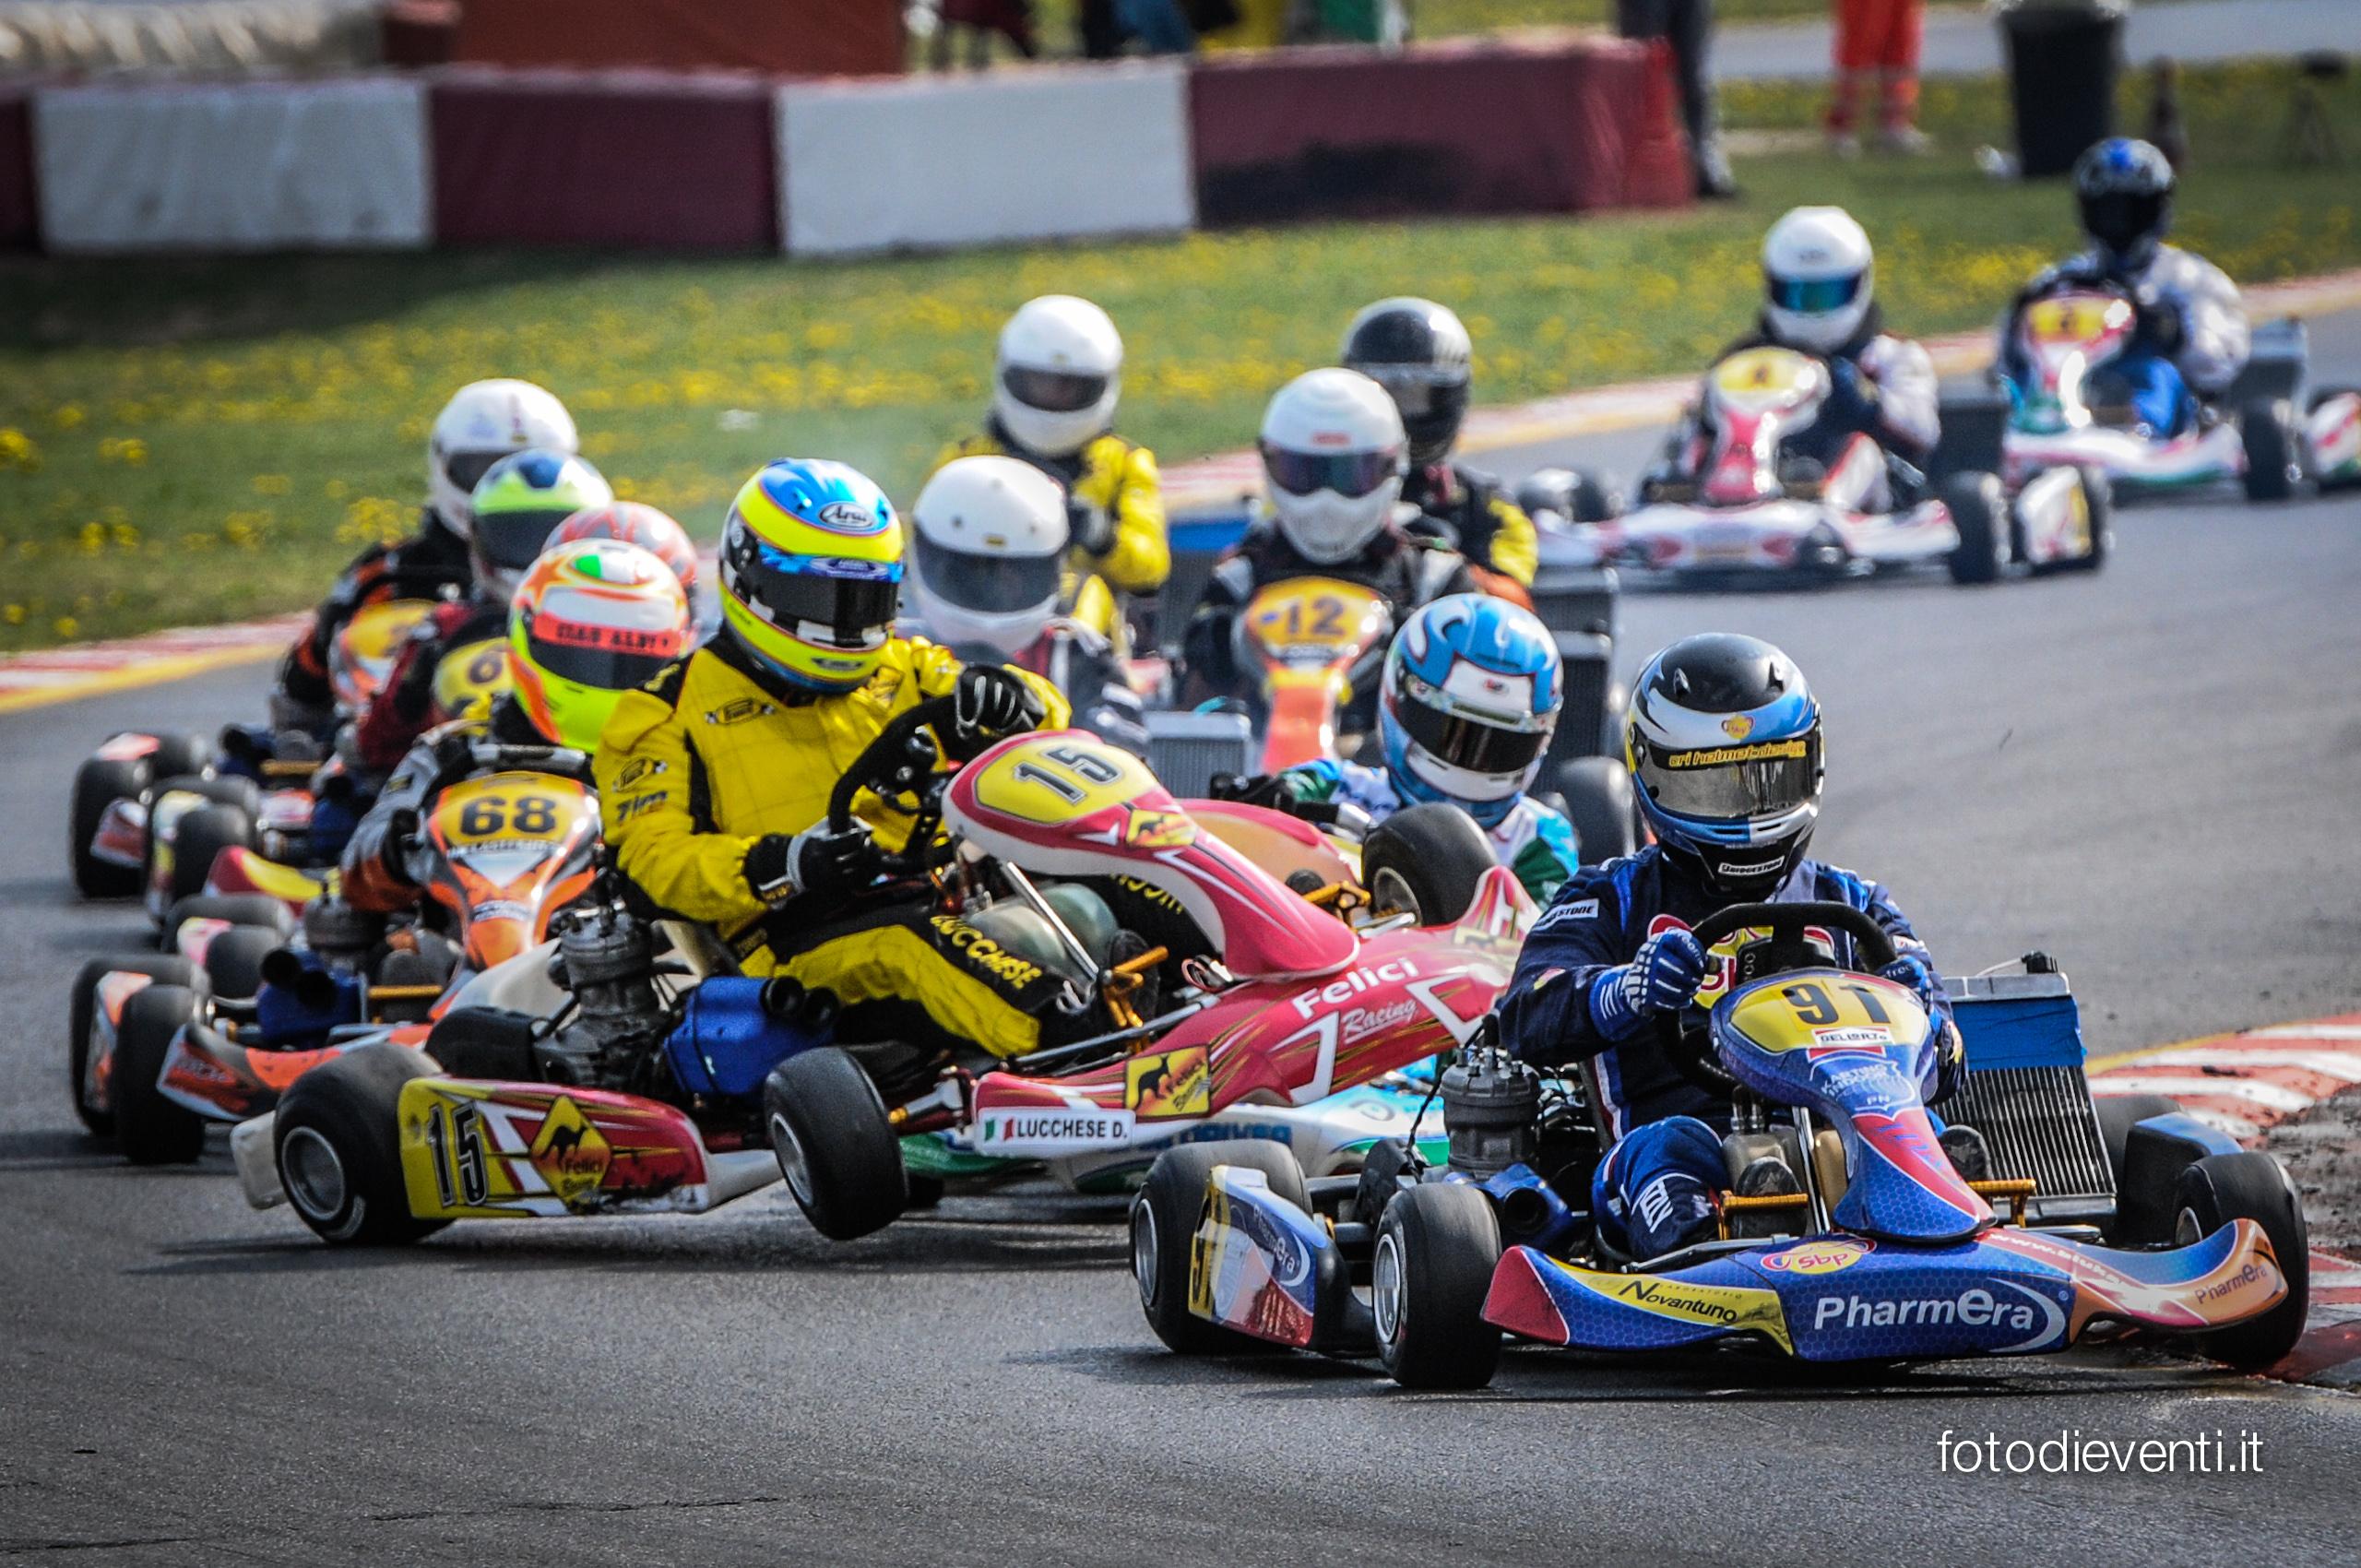 Championkart2012 @ Lonato